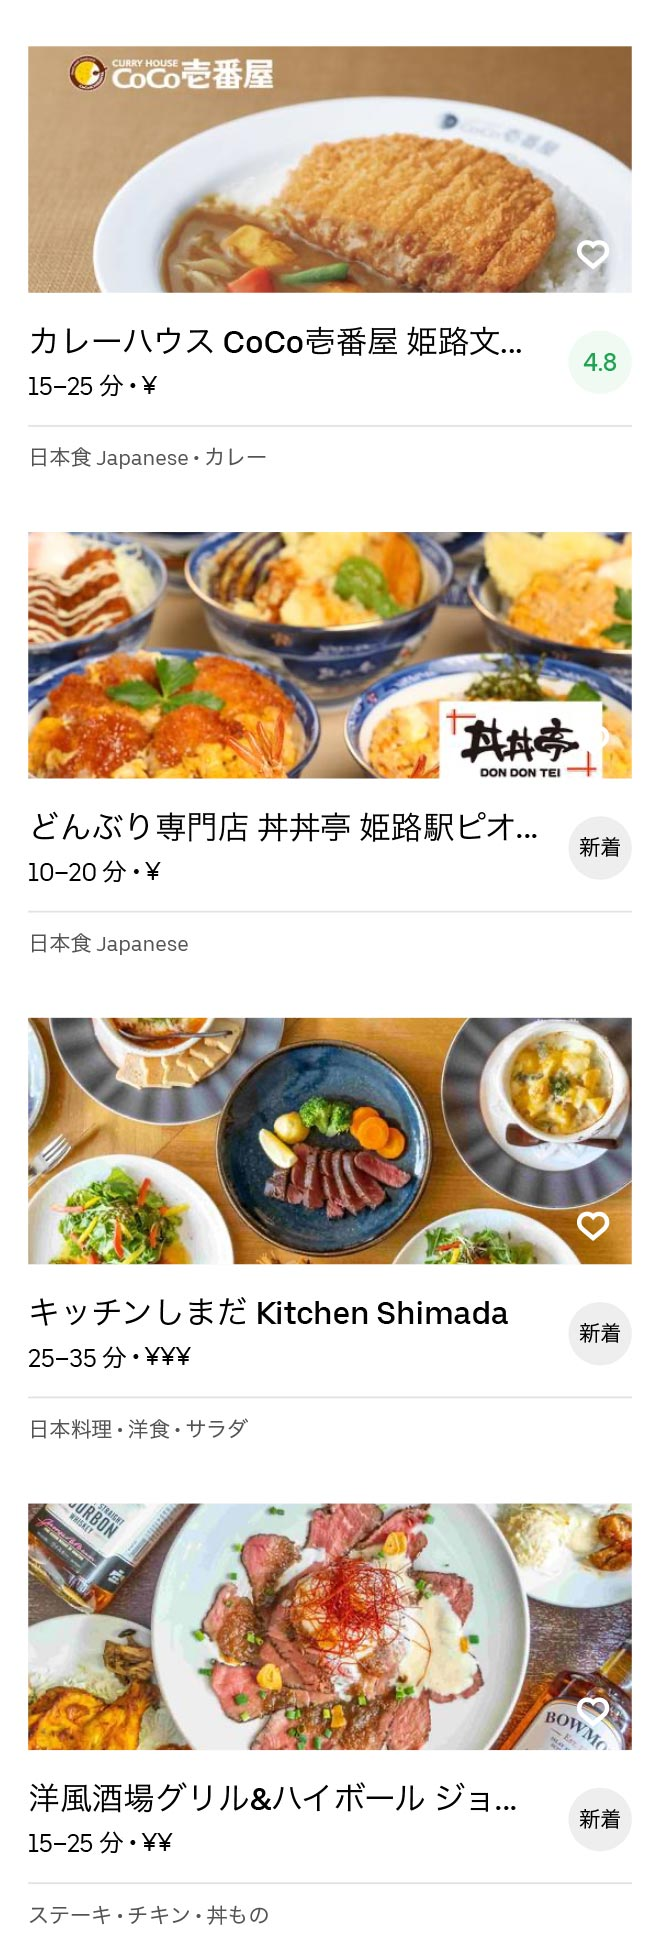 Himeji menu 2007 03